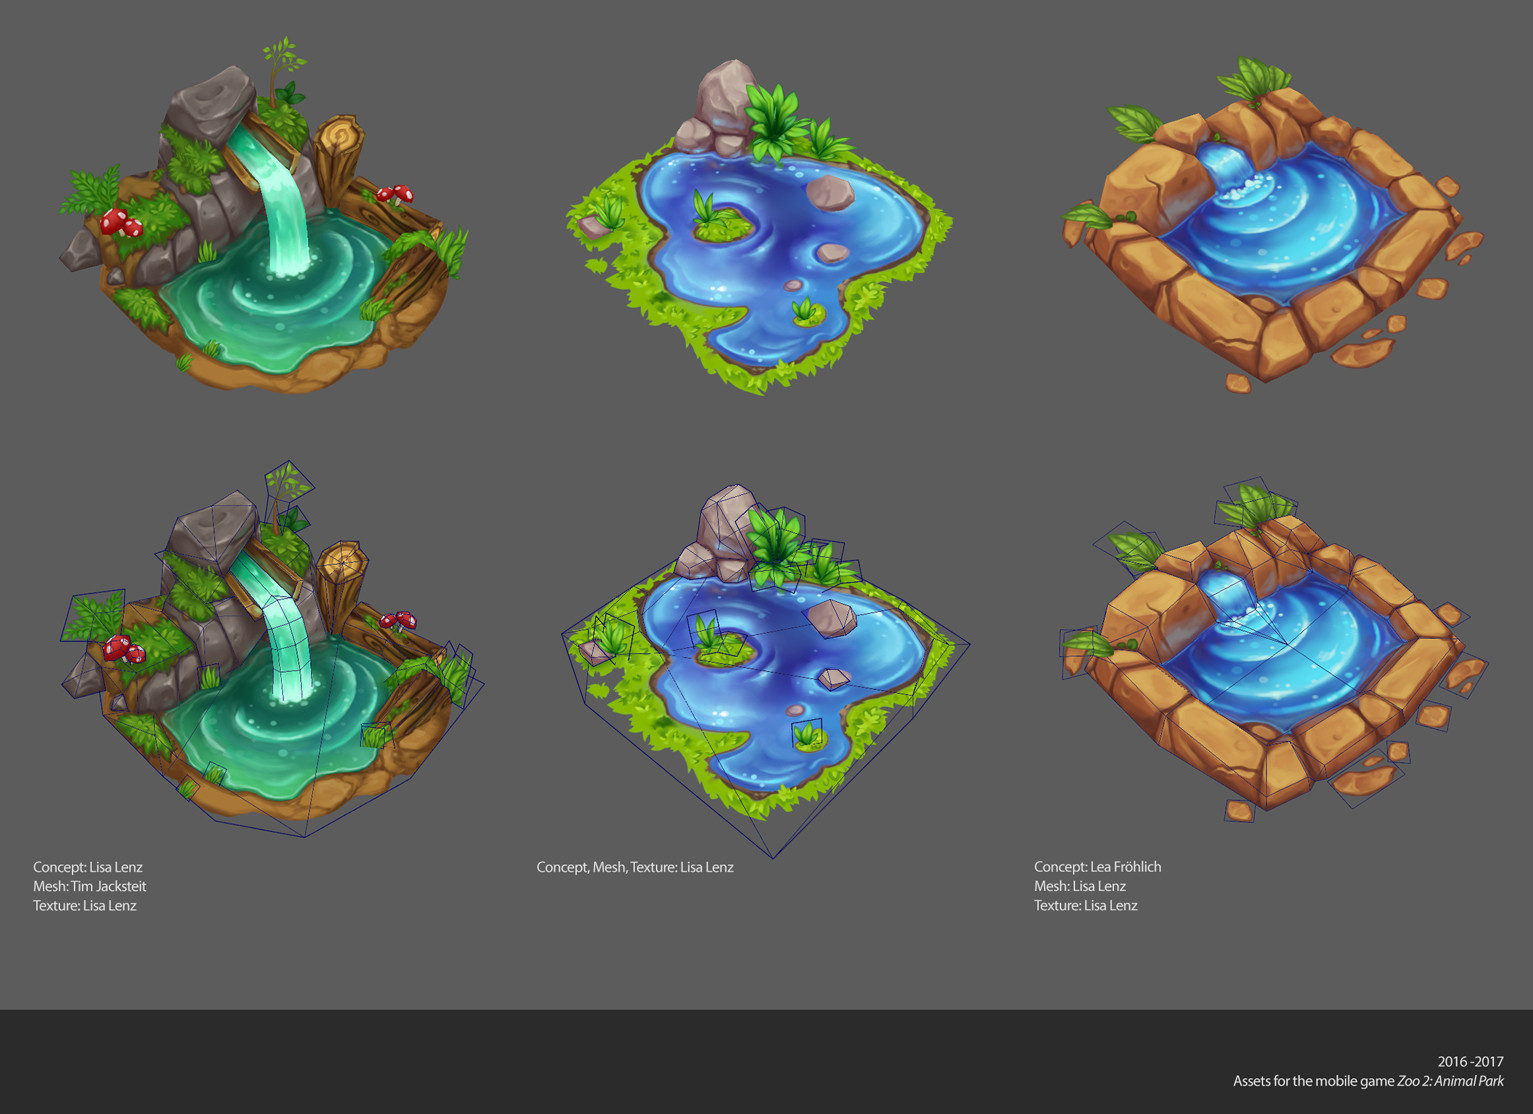 Lisa lenz watering screenshots 2 s